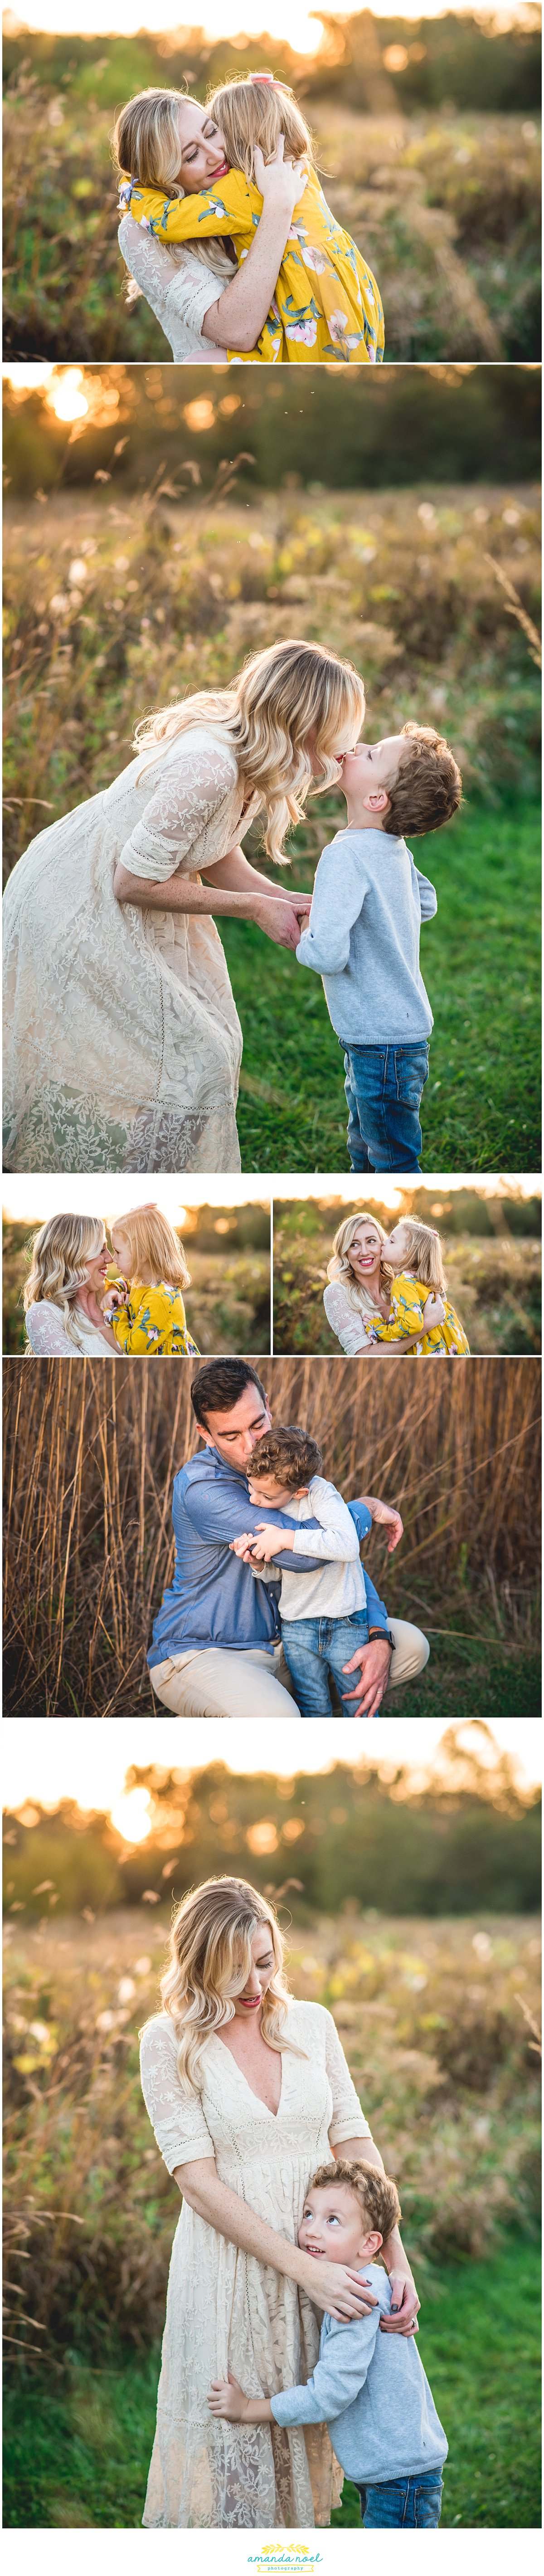 Columbus OH family photography | Amanda Noel Photography